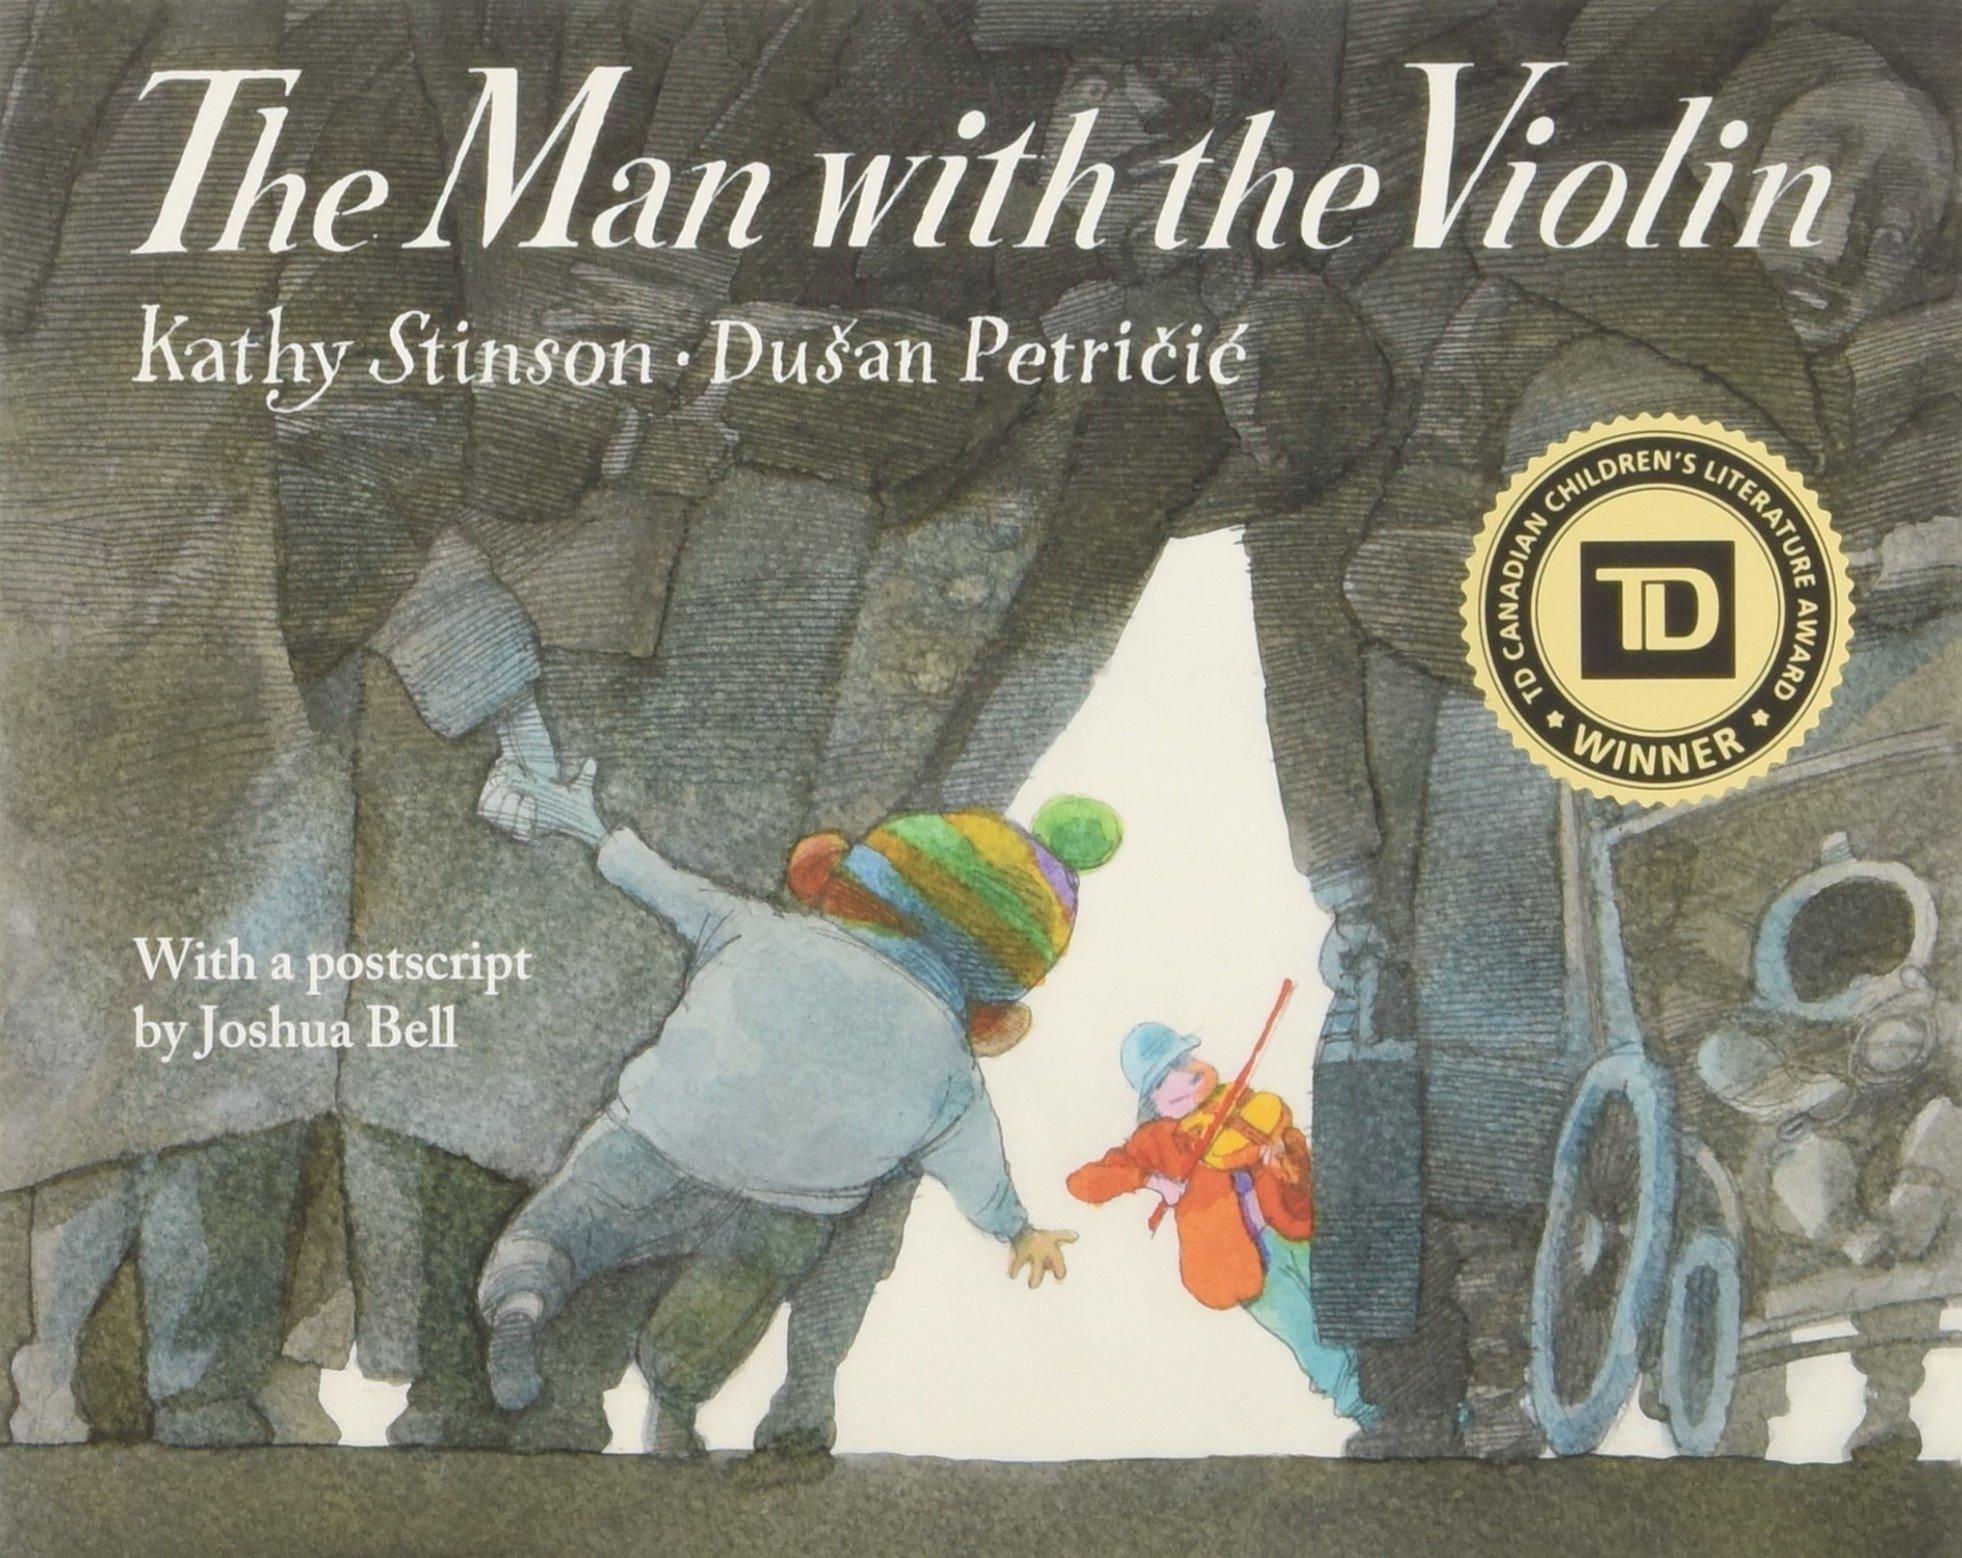 Amazon.com: The Man With the Violin (9781554515646): Stinson, Kathy,  Petricic, Dušan, Bell, Joshua: Books